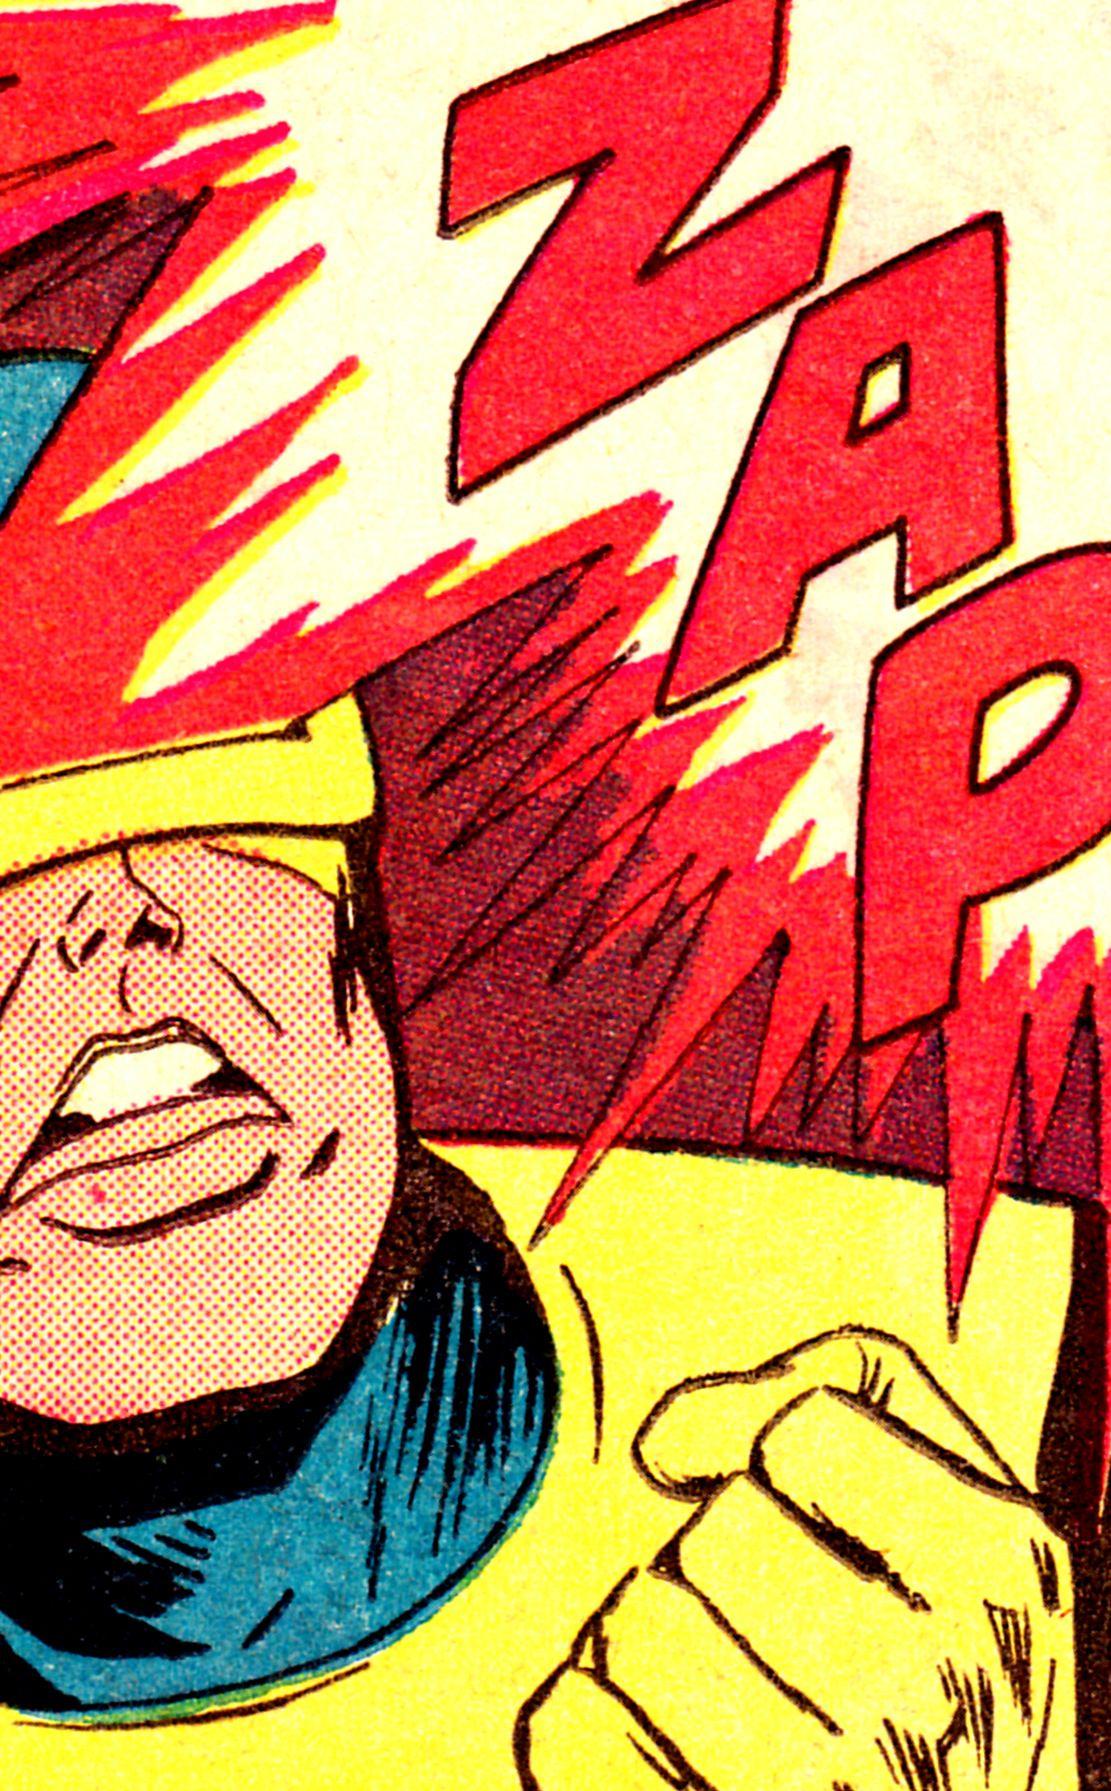 Cyclops- Jay Gavin & Dick Ayers (X-Men #18, March 1966)